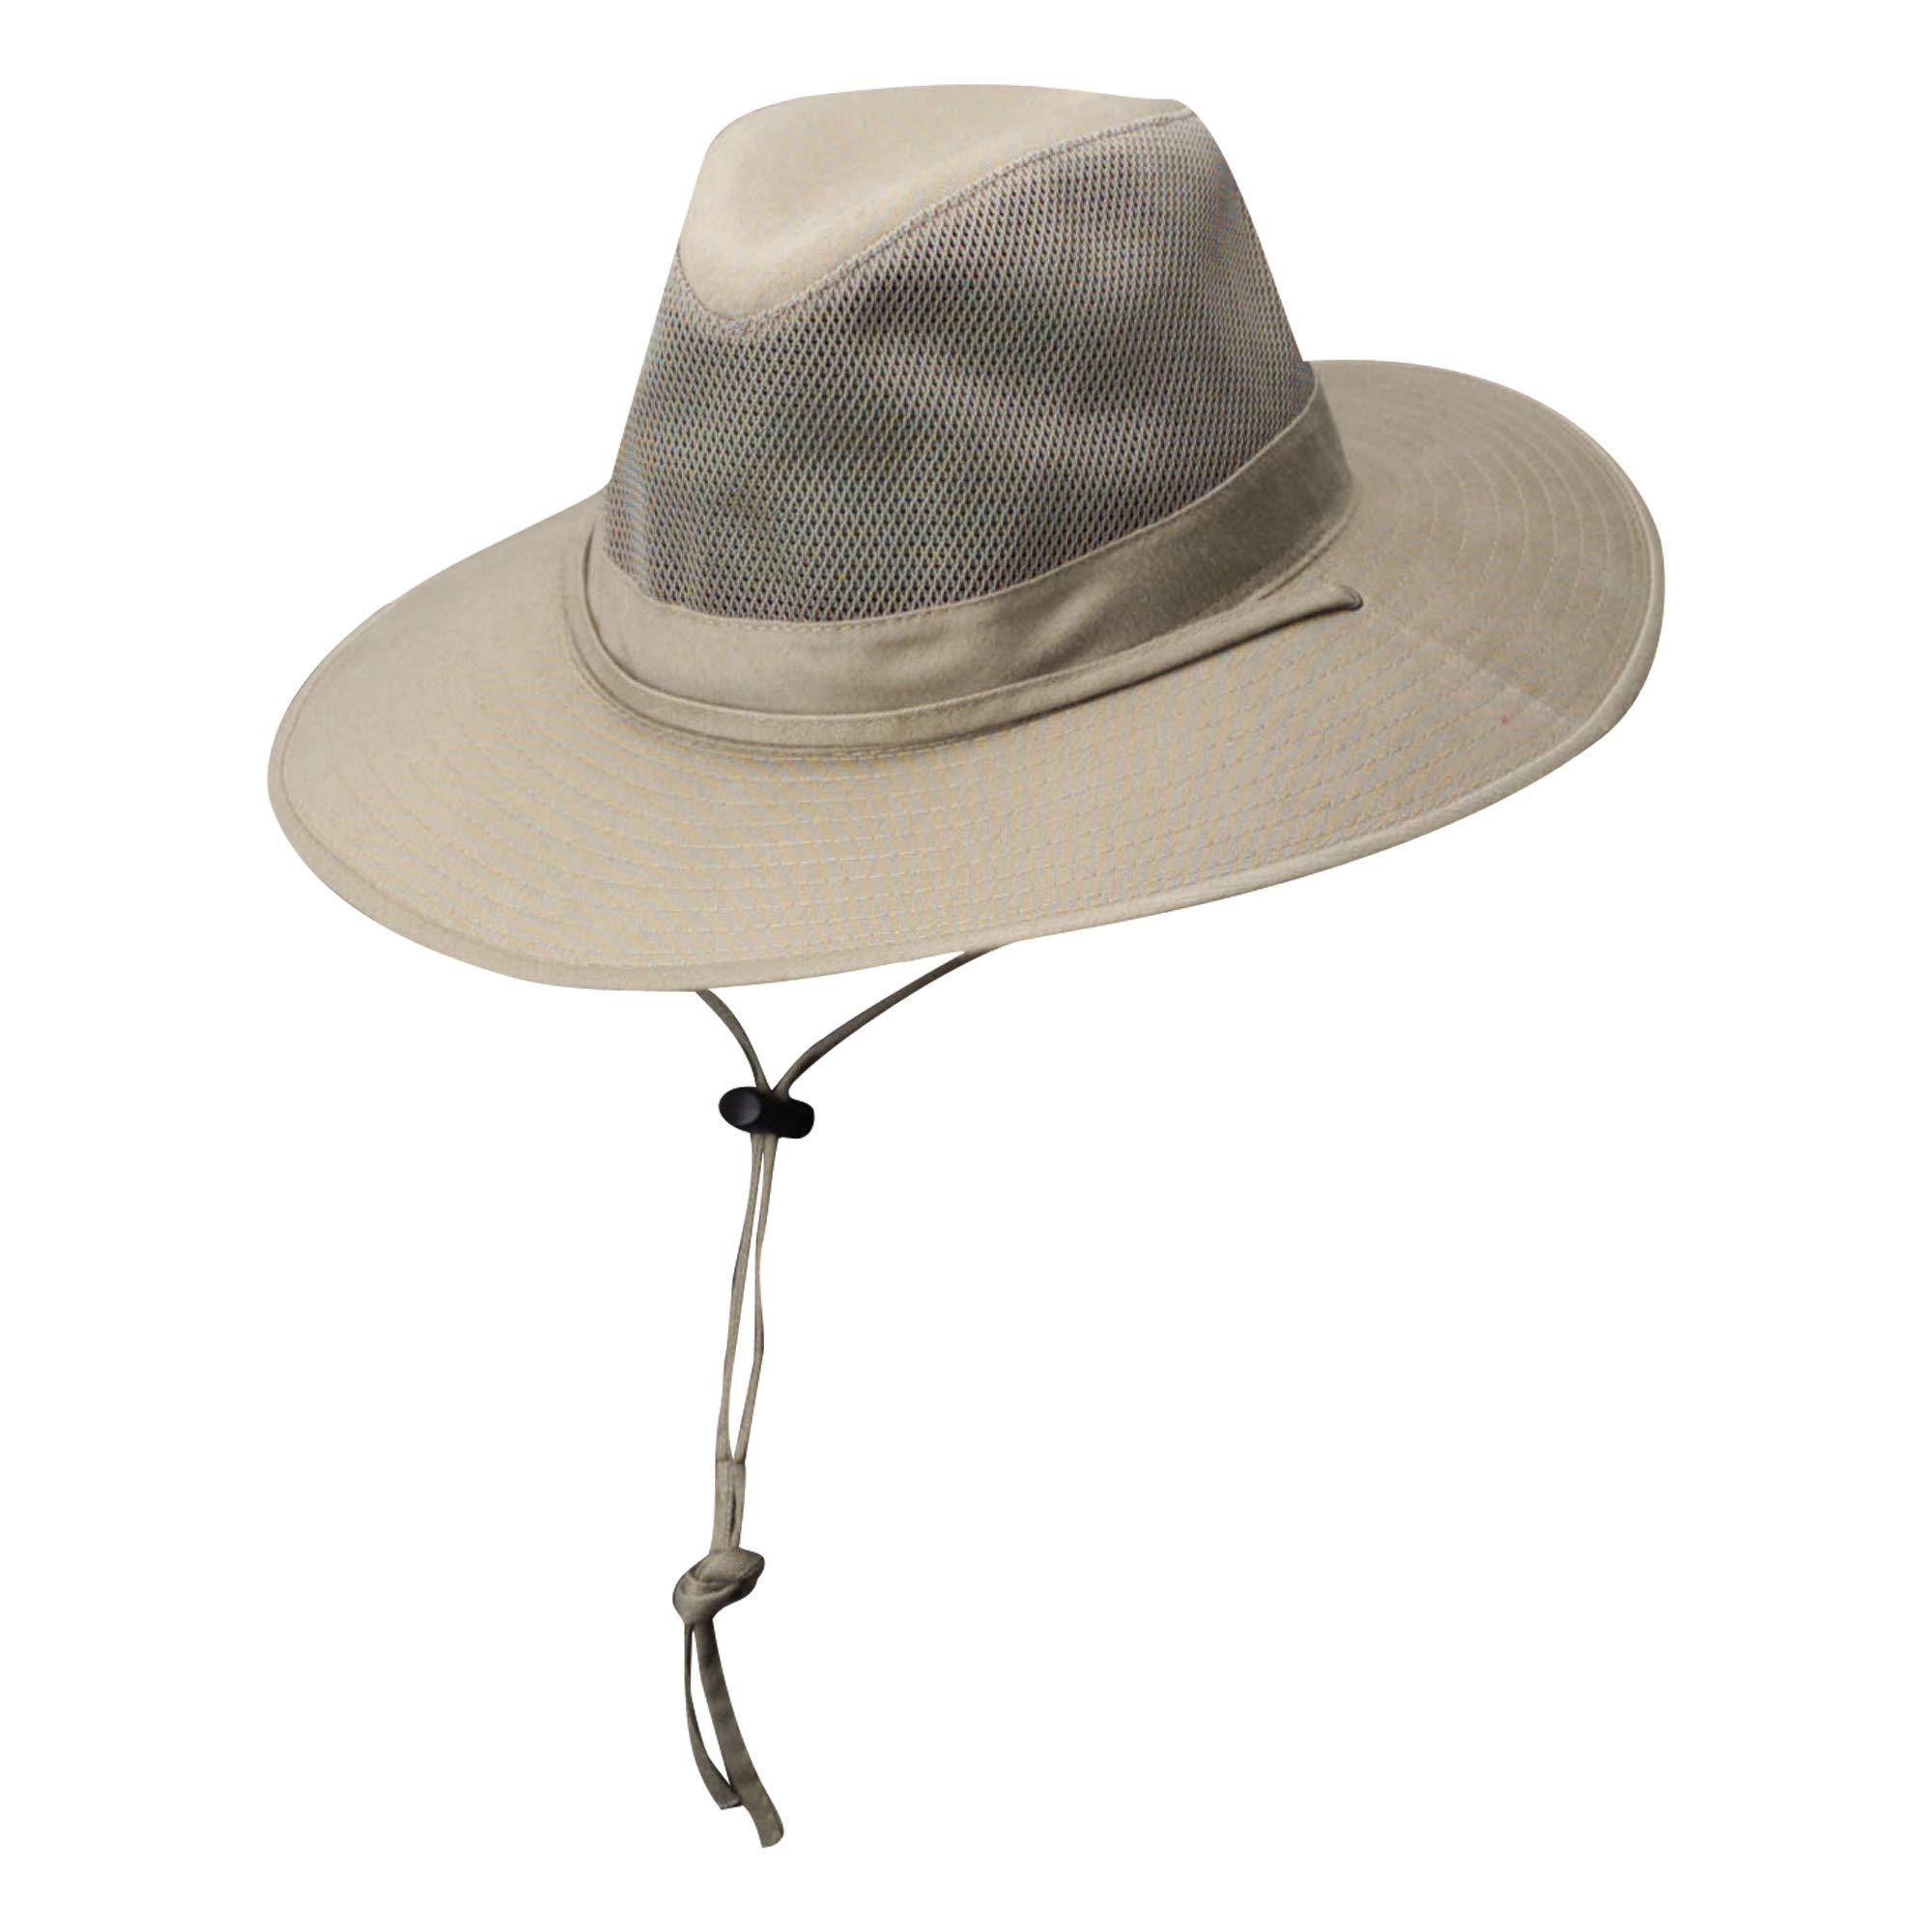 cc1878b9b1386 Best Rated in Men s Sun Hats   Helpful Customer Reviews - Amazon.com